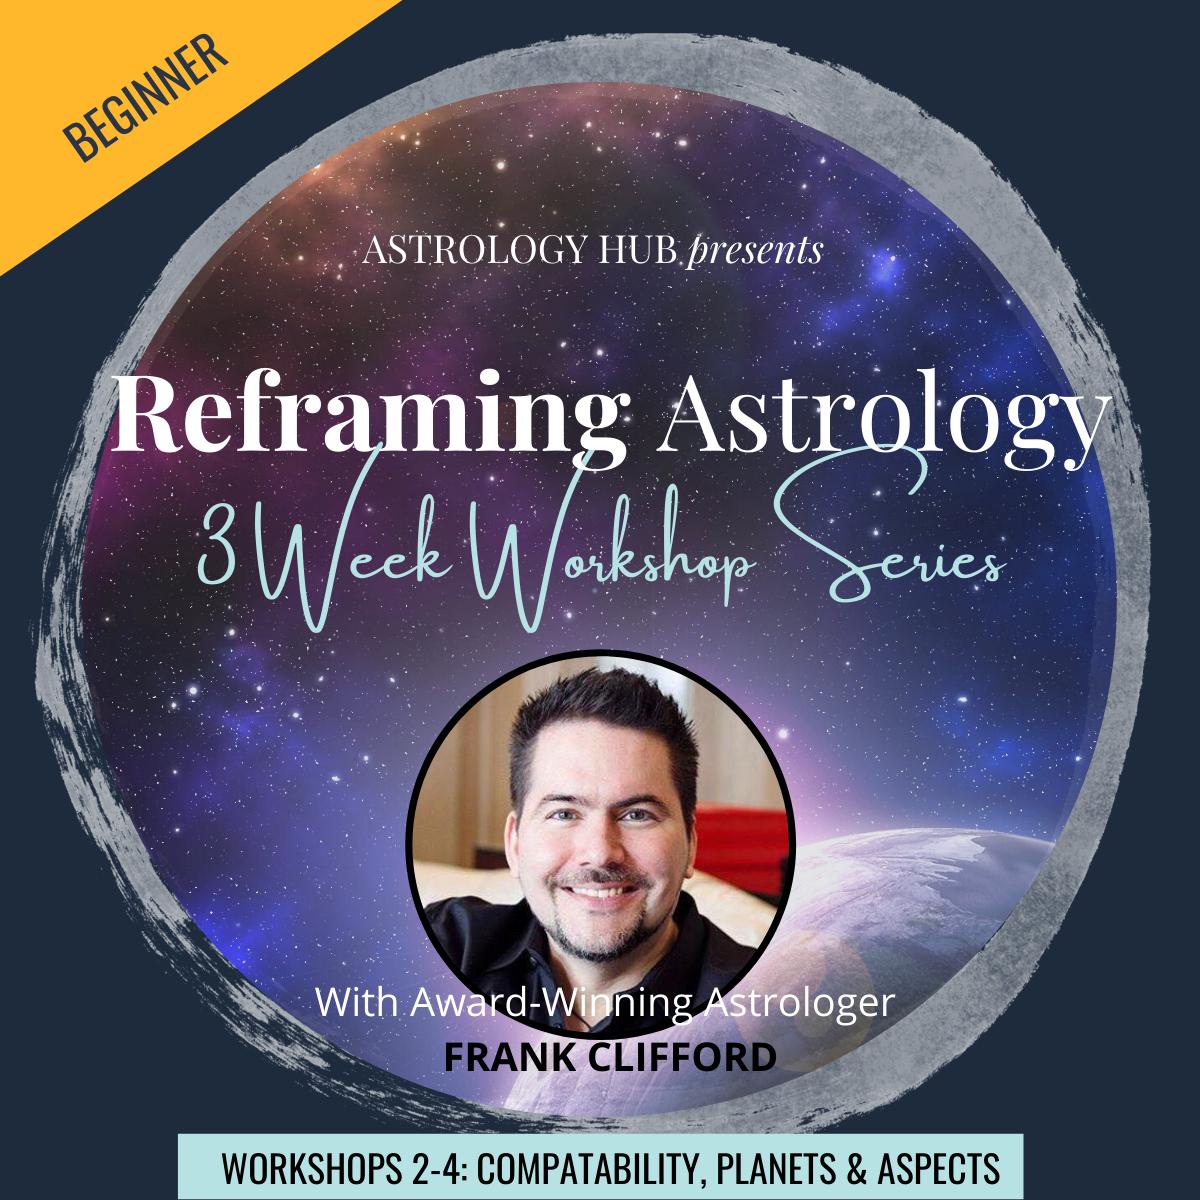 Reframing Astrology - Astrology hub - Course Catalog